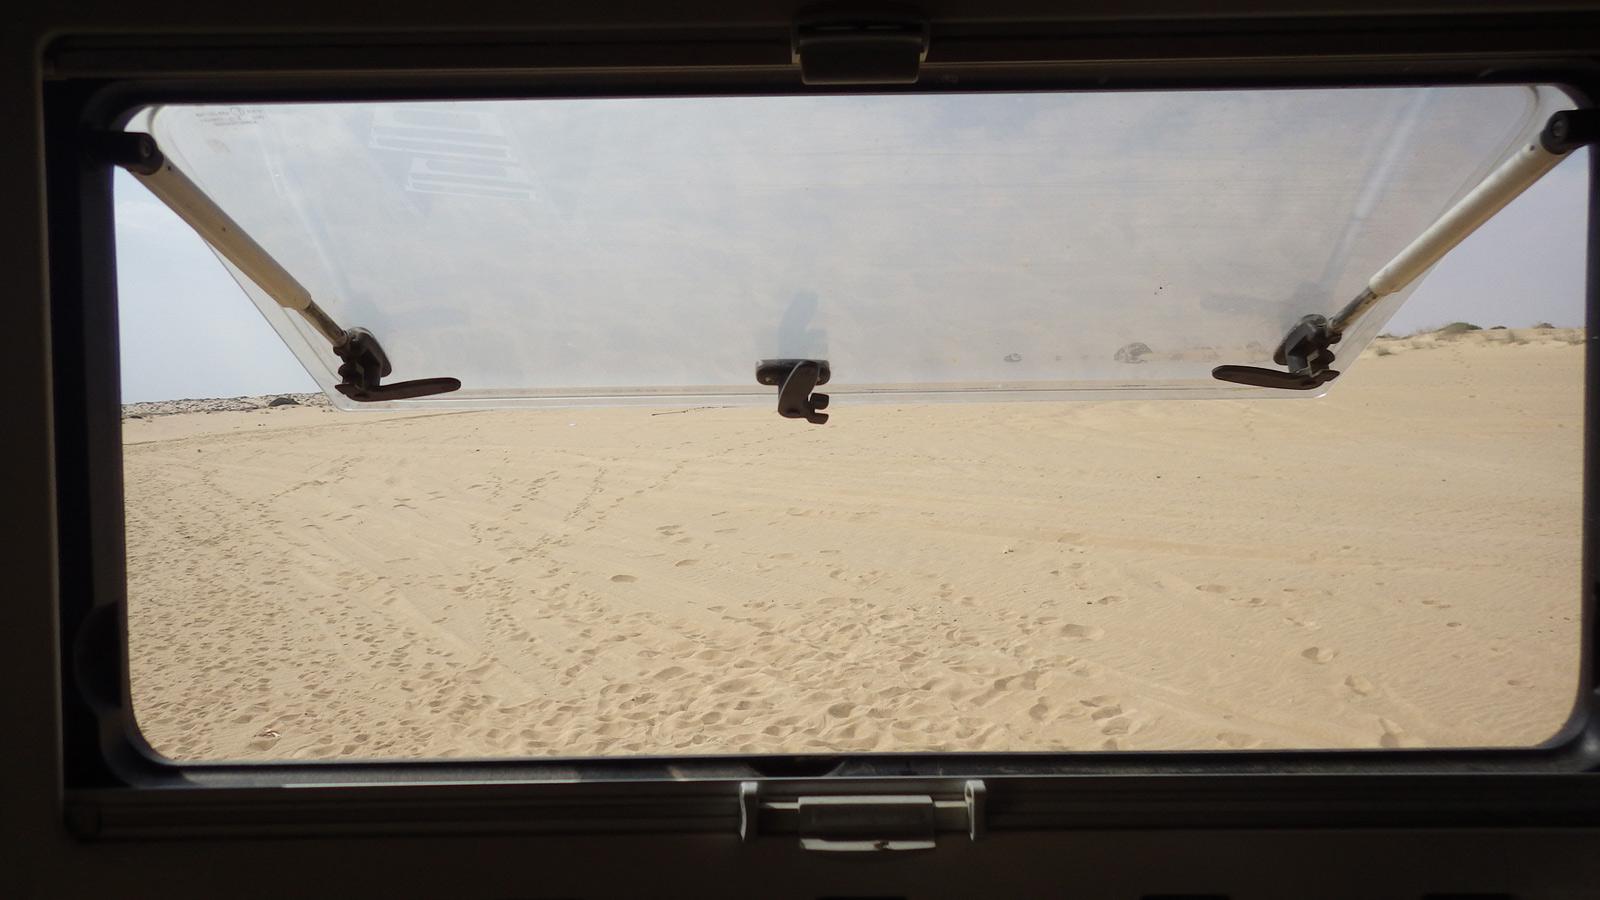 IMGP2907_2016_01_14-sortie-désert-Wahiba-Sands-bord-de-mer(Oman)